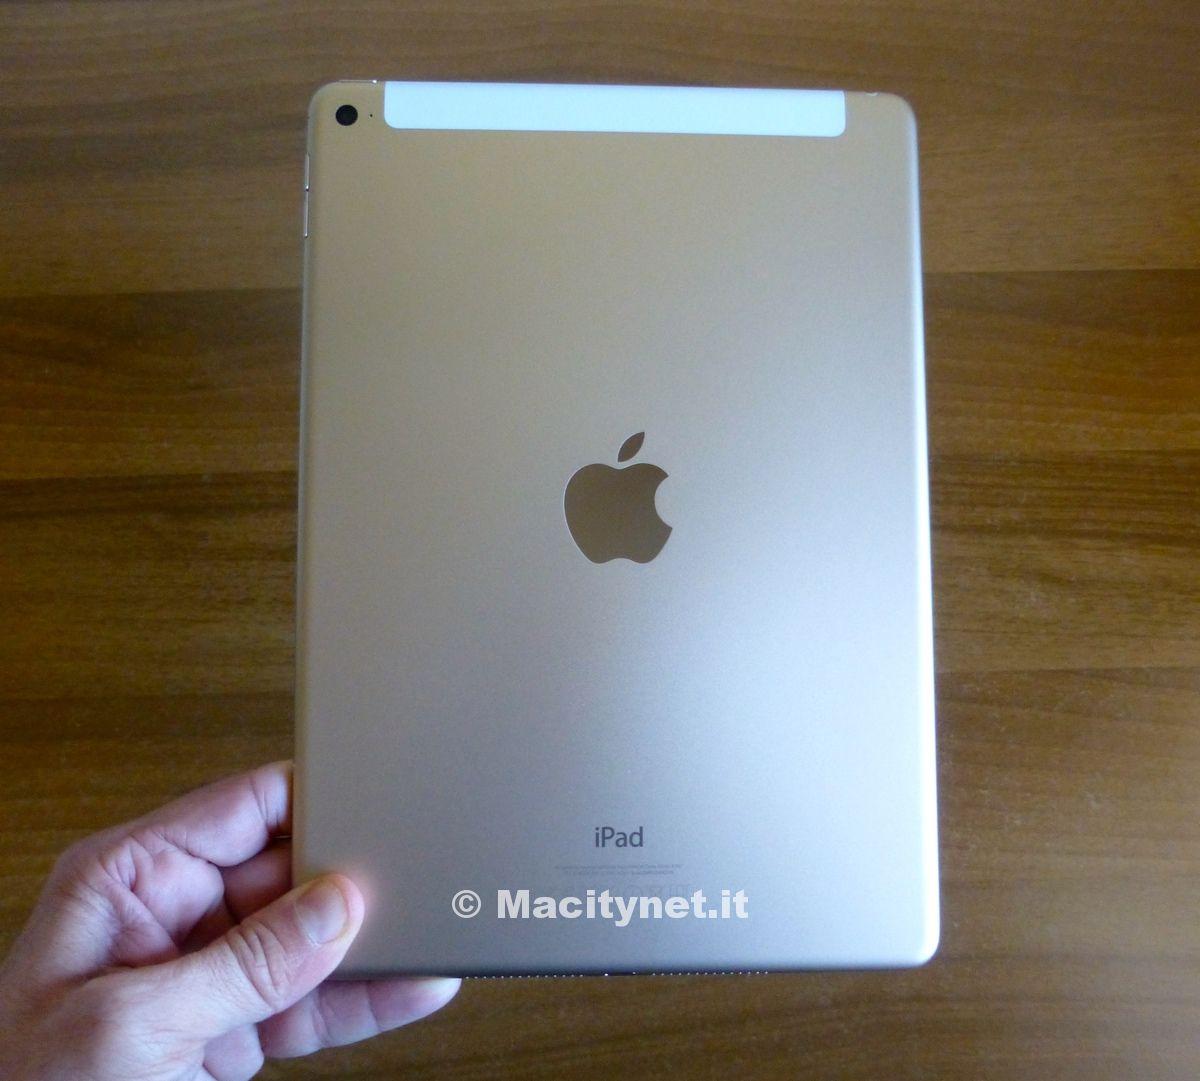 iPad Air 2 unboxing 9